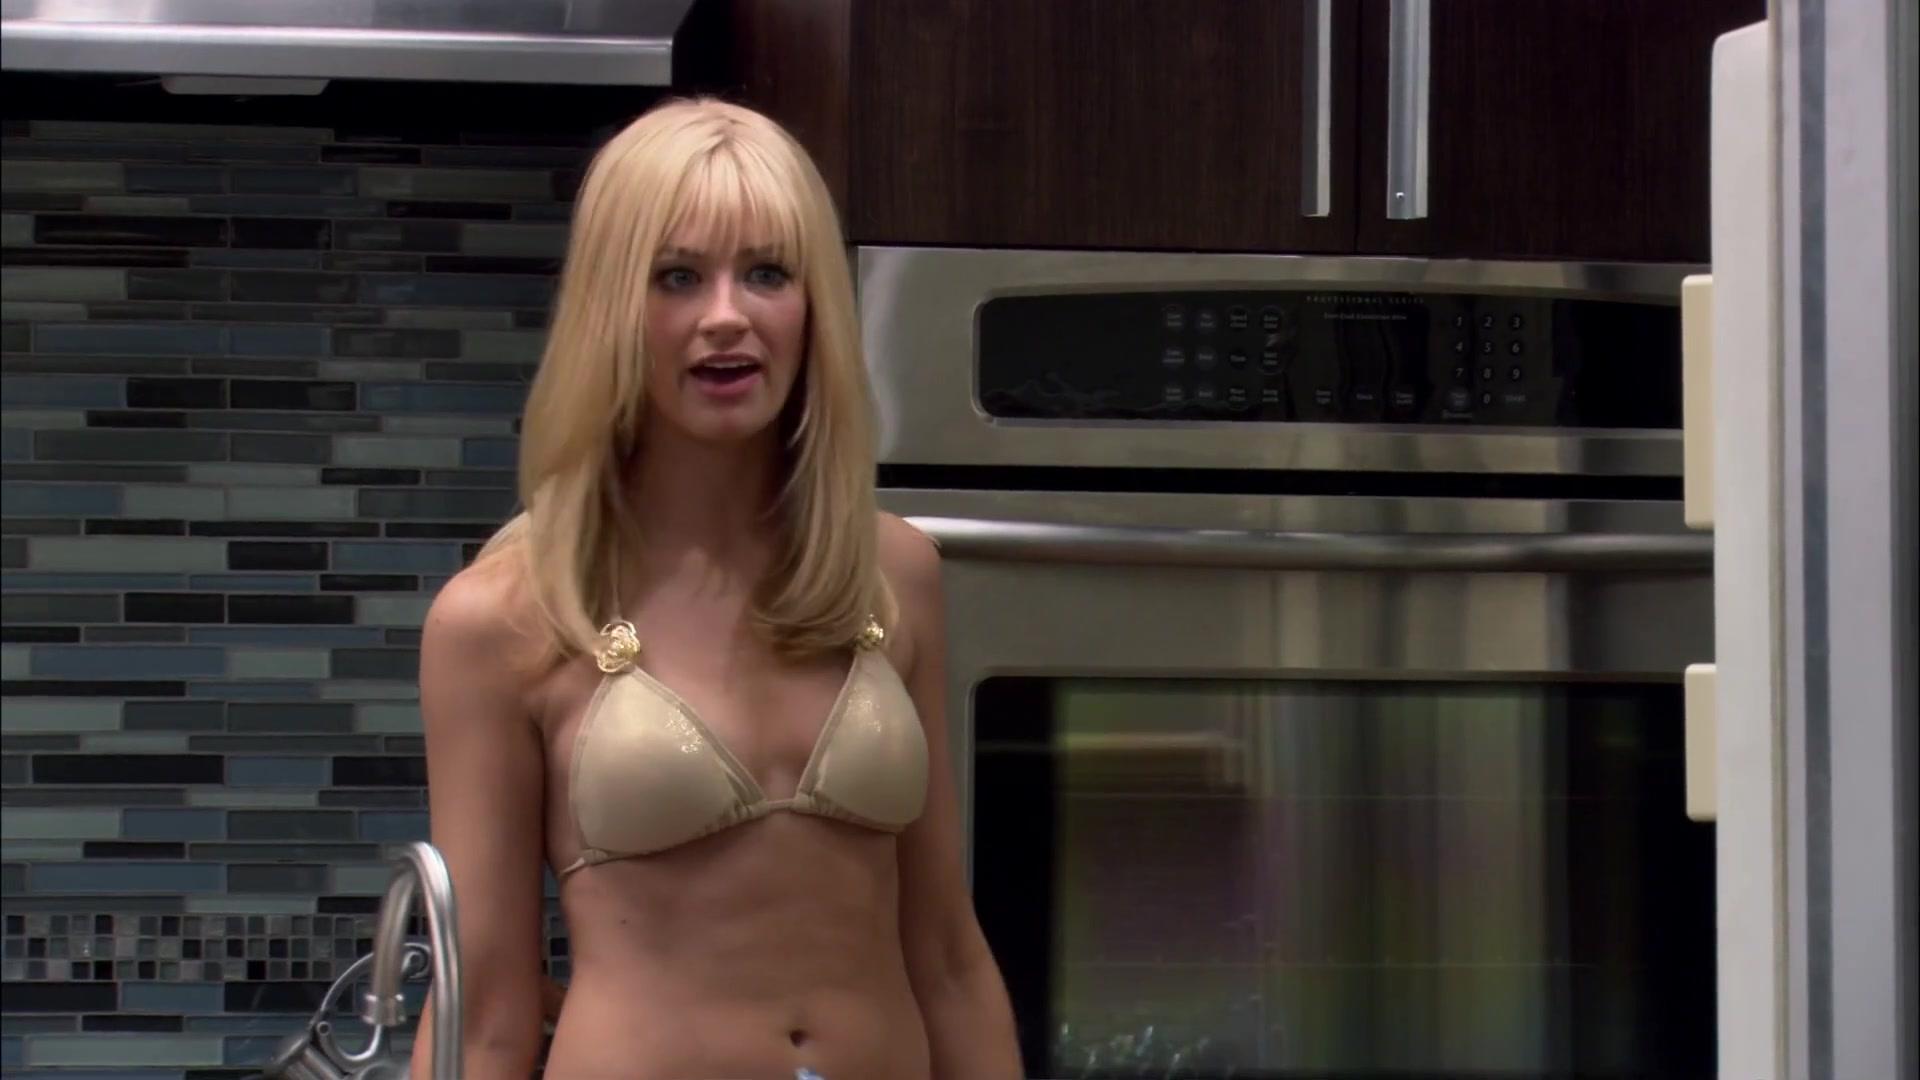 Beth Behrs sexy - 2 Broke Girls s01e19 (2011)